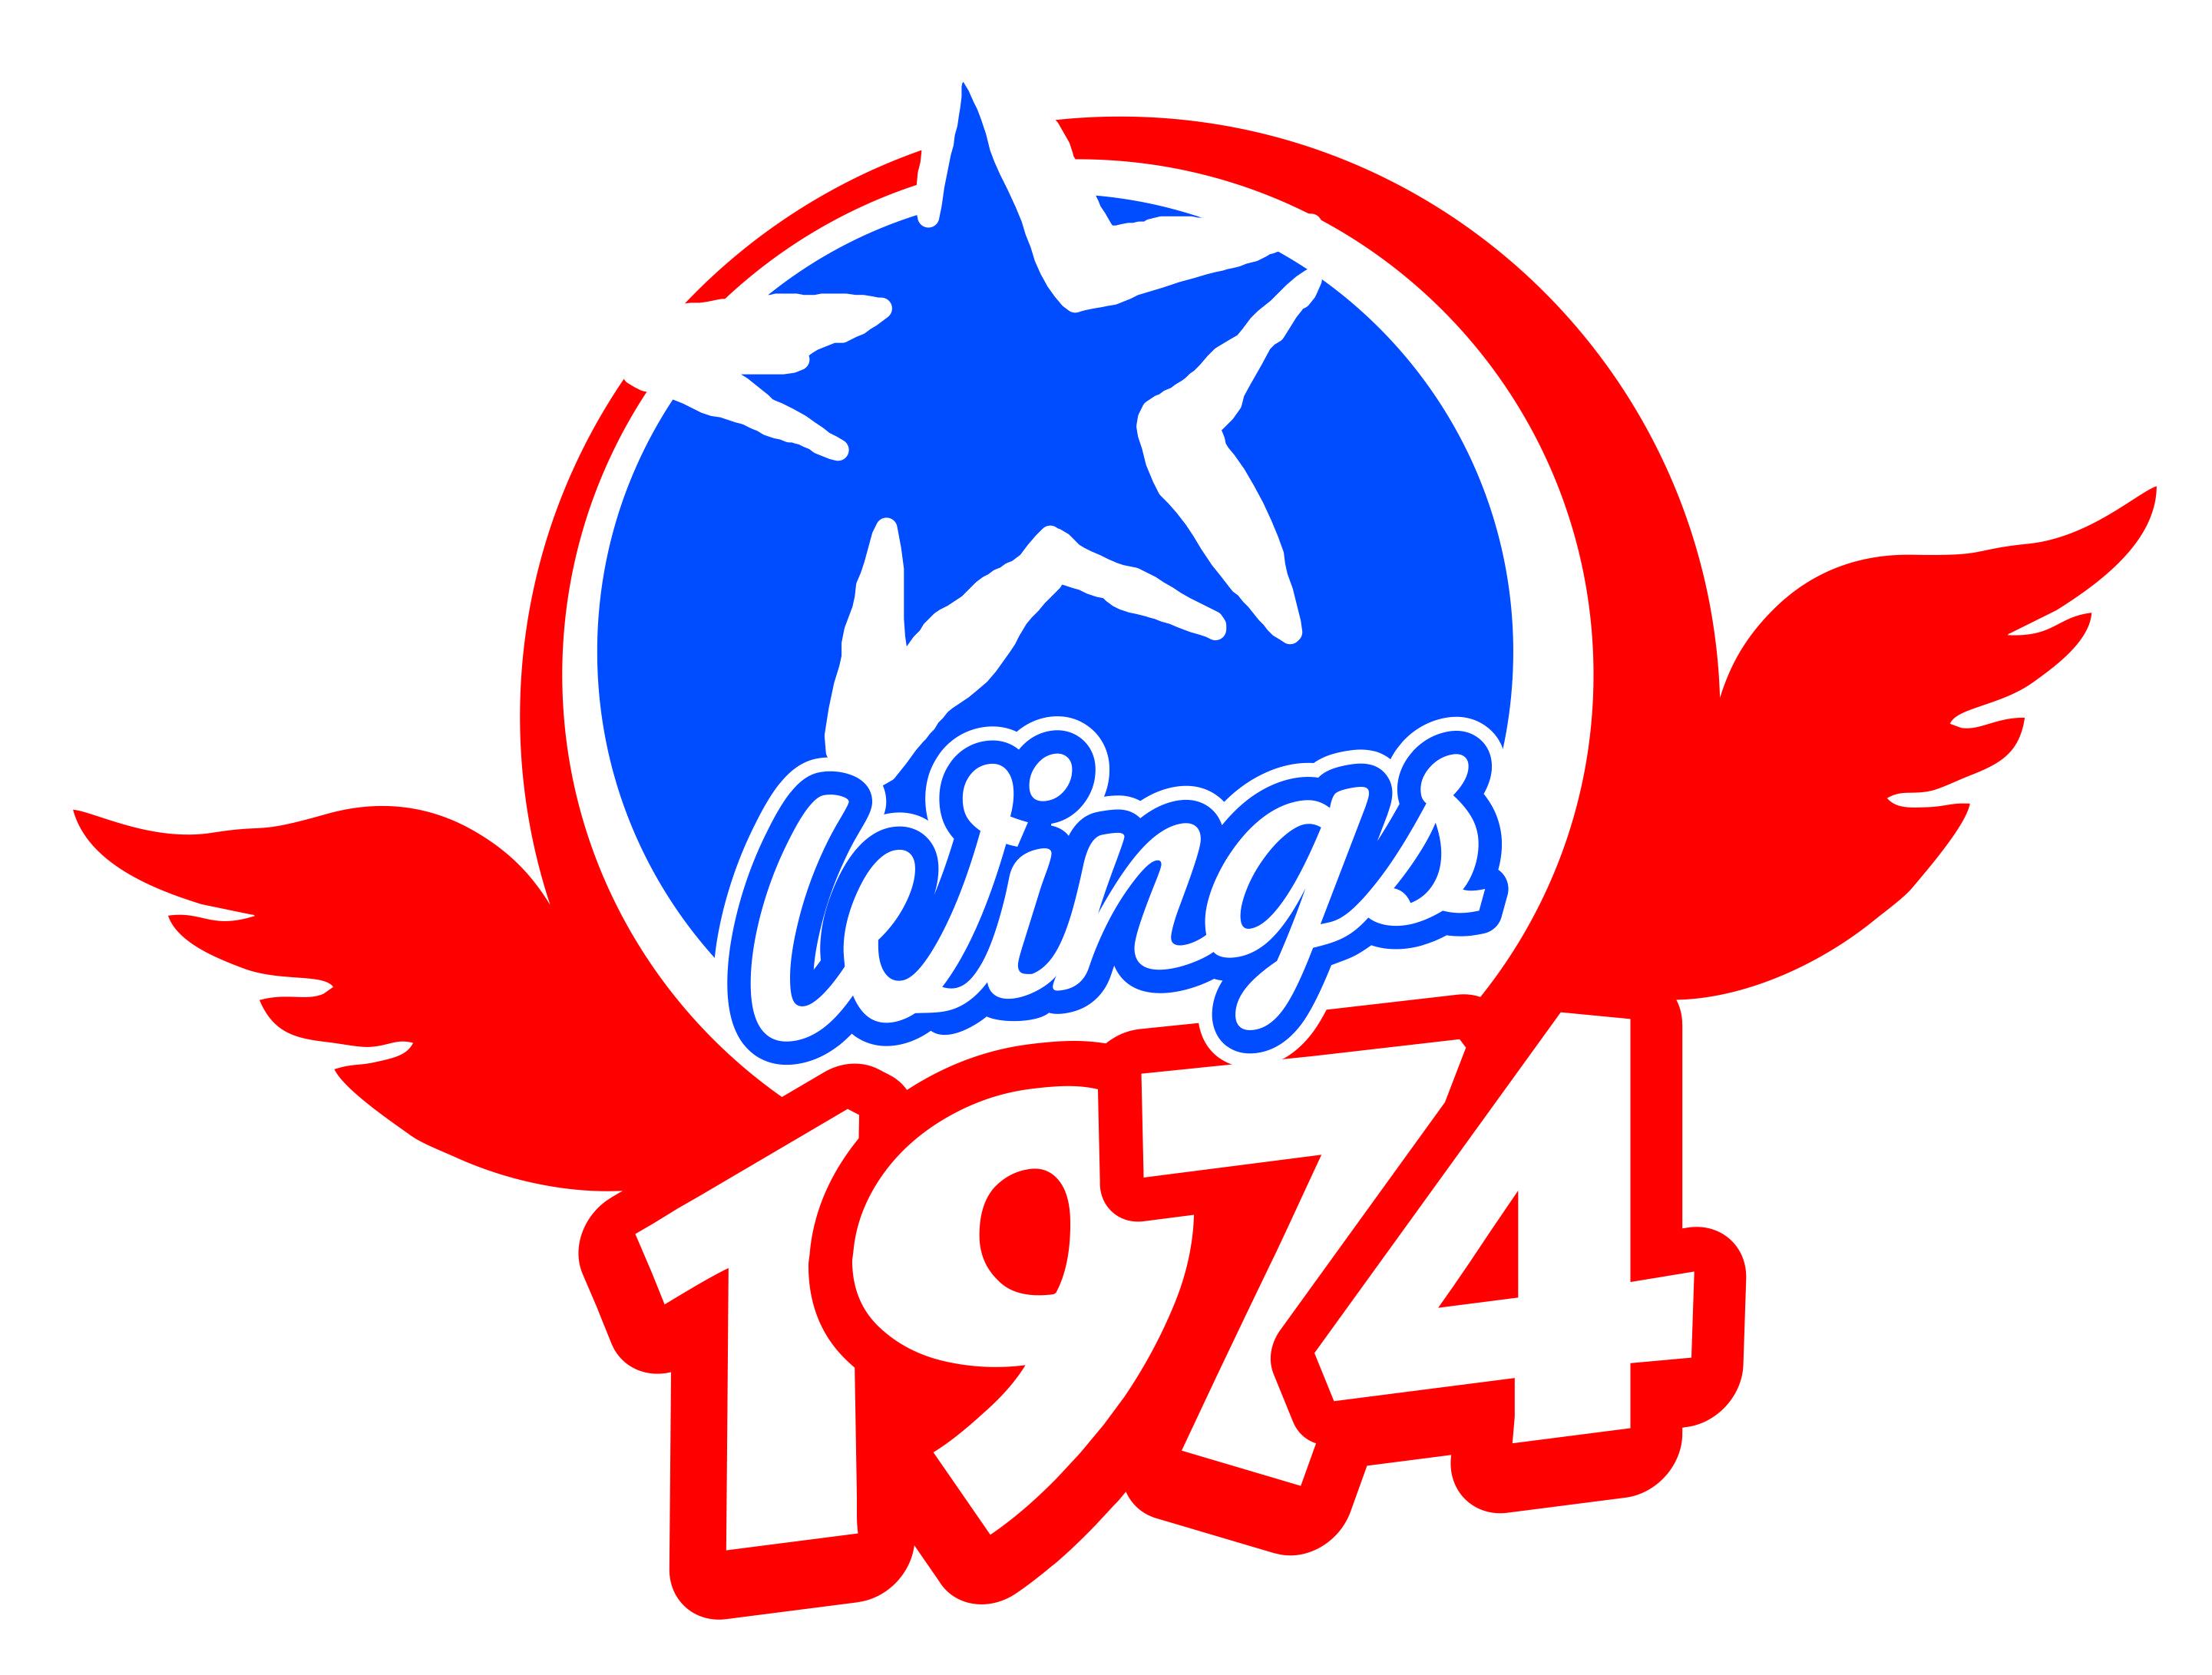 Wings 1974 Limonar